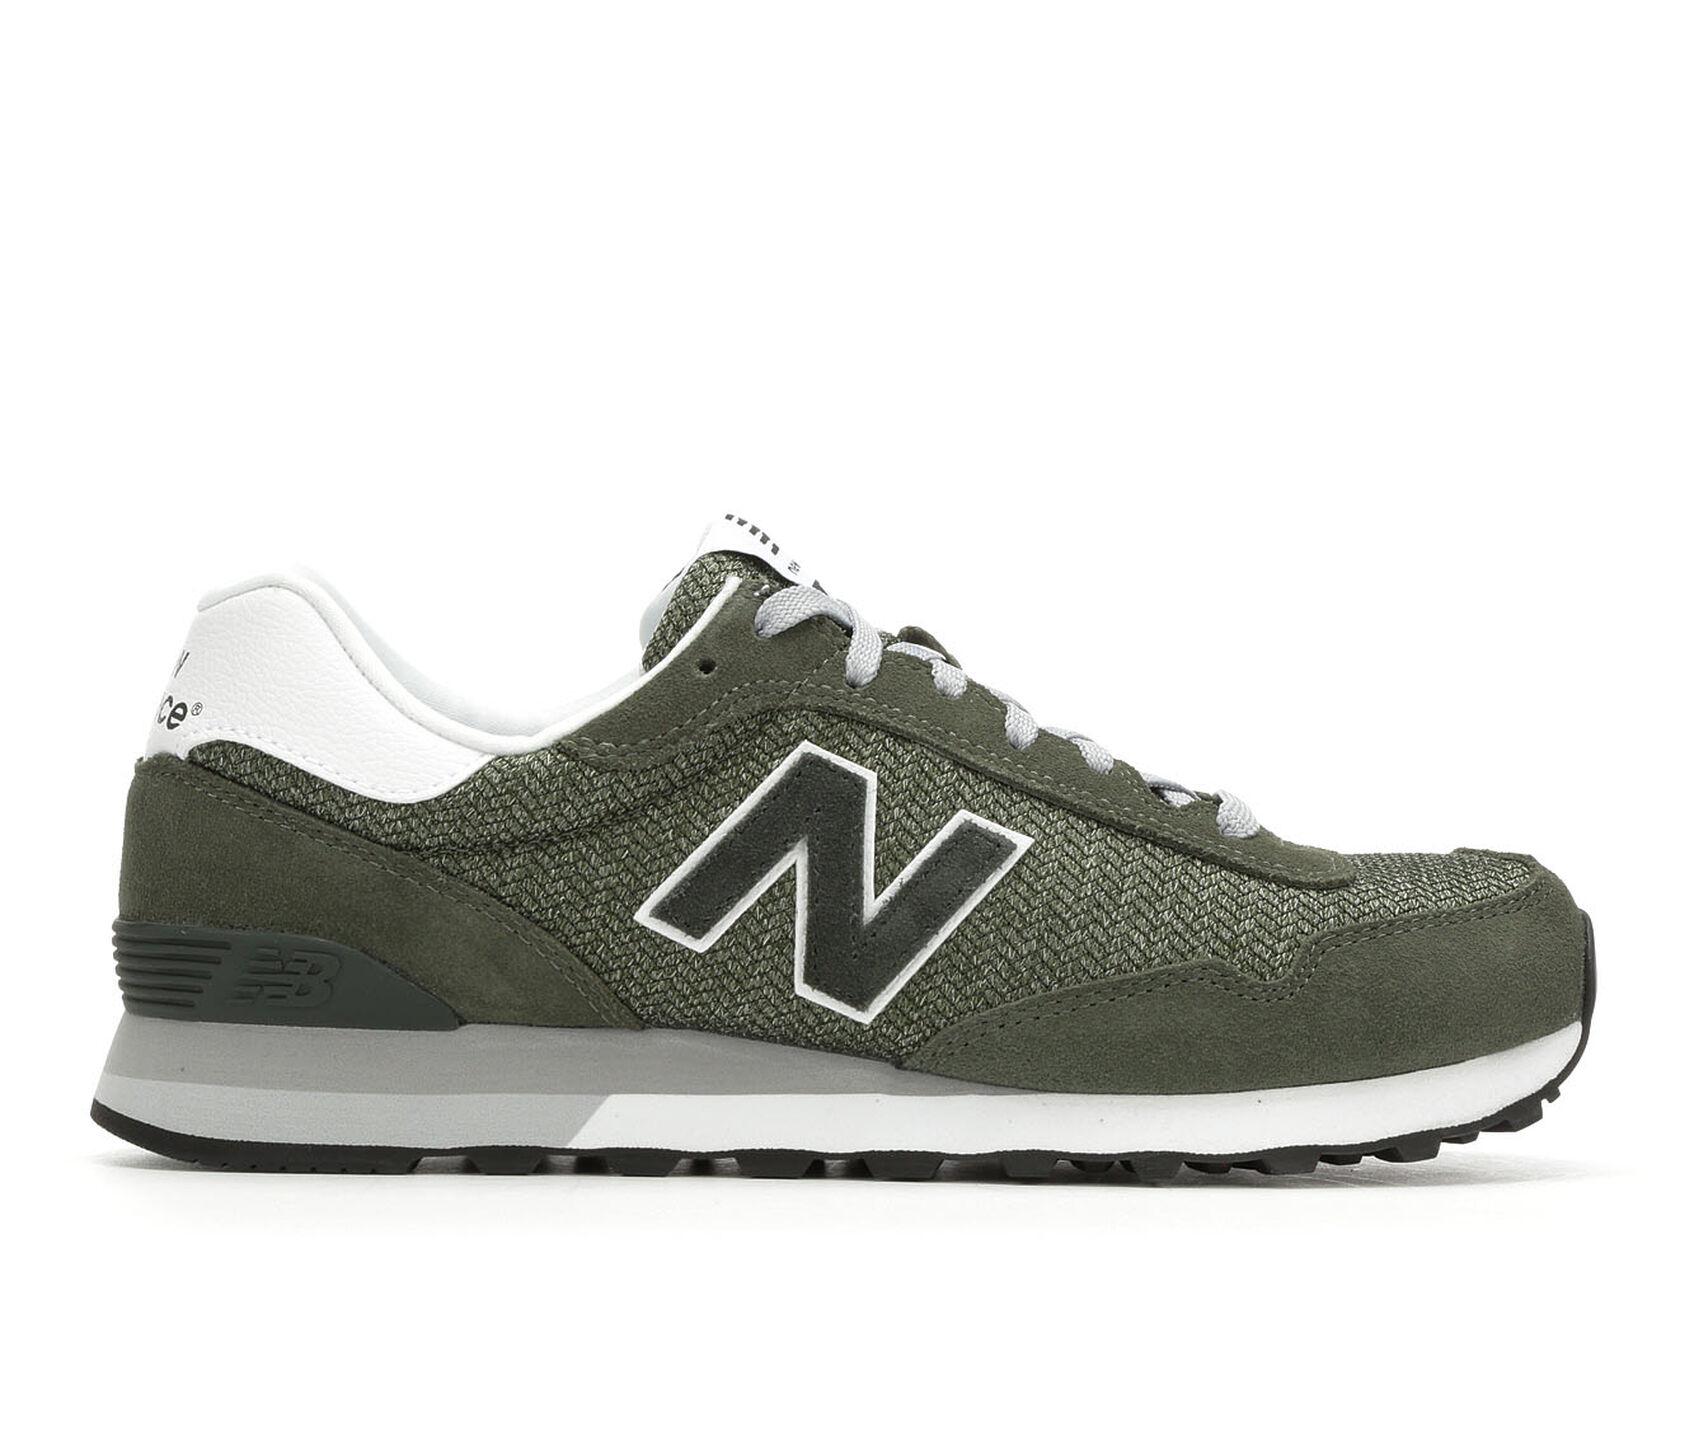 designer fashion 0ef01 73f1a Men s New Balance ML515 Retro Sneakers   Shoe Carnival